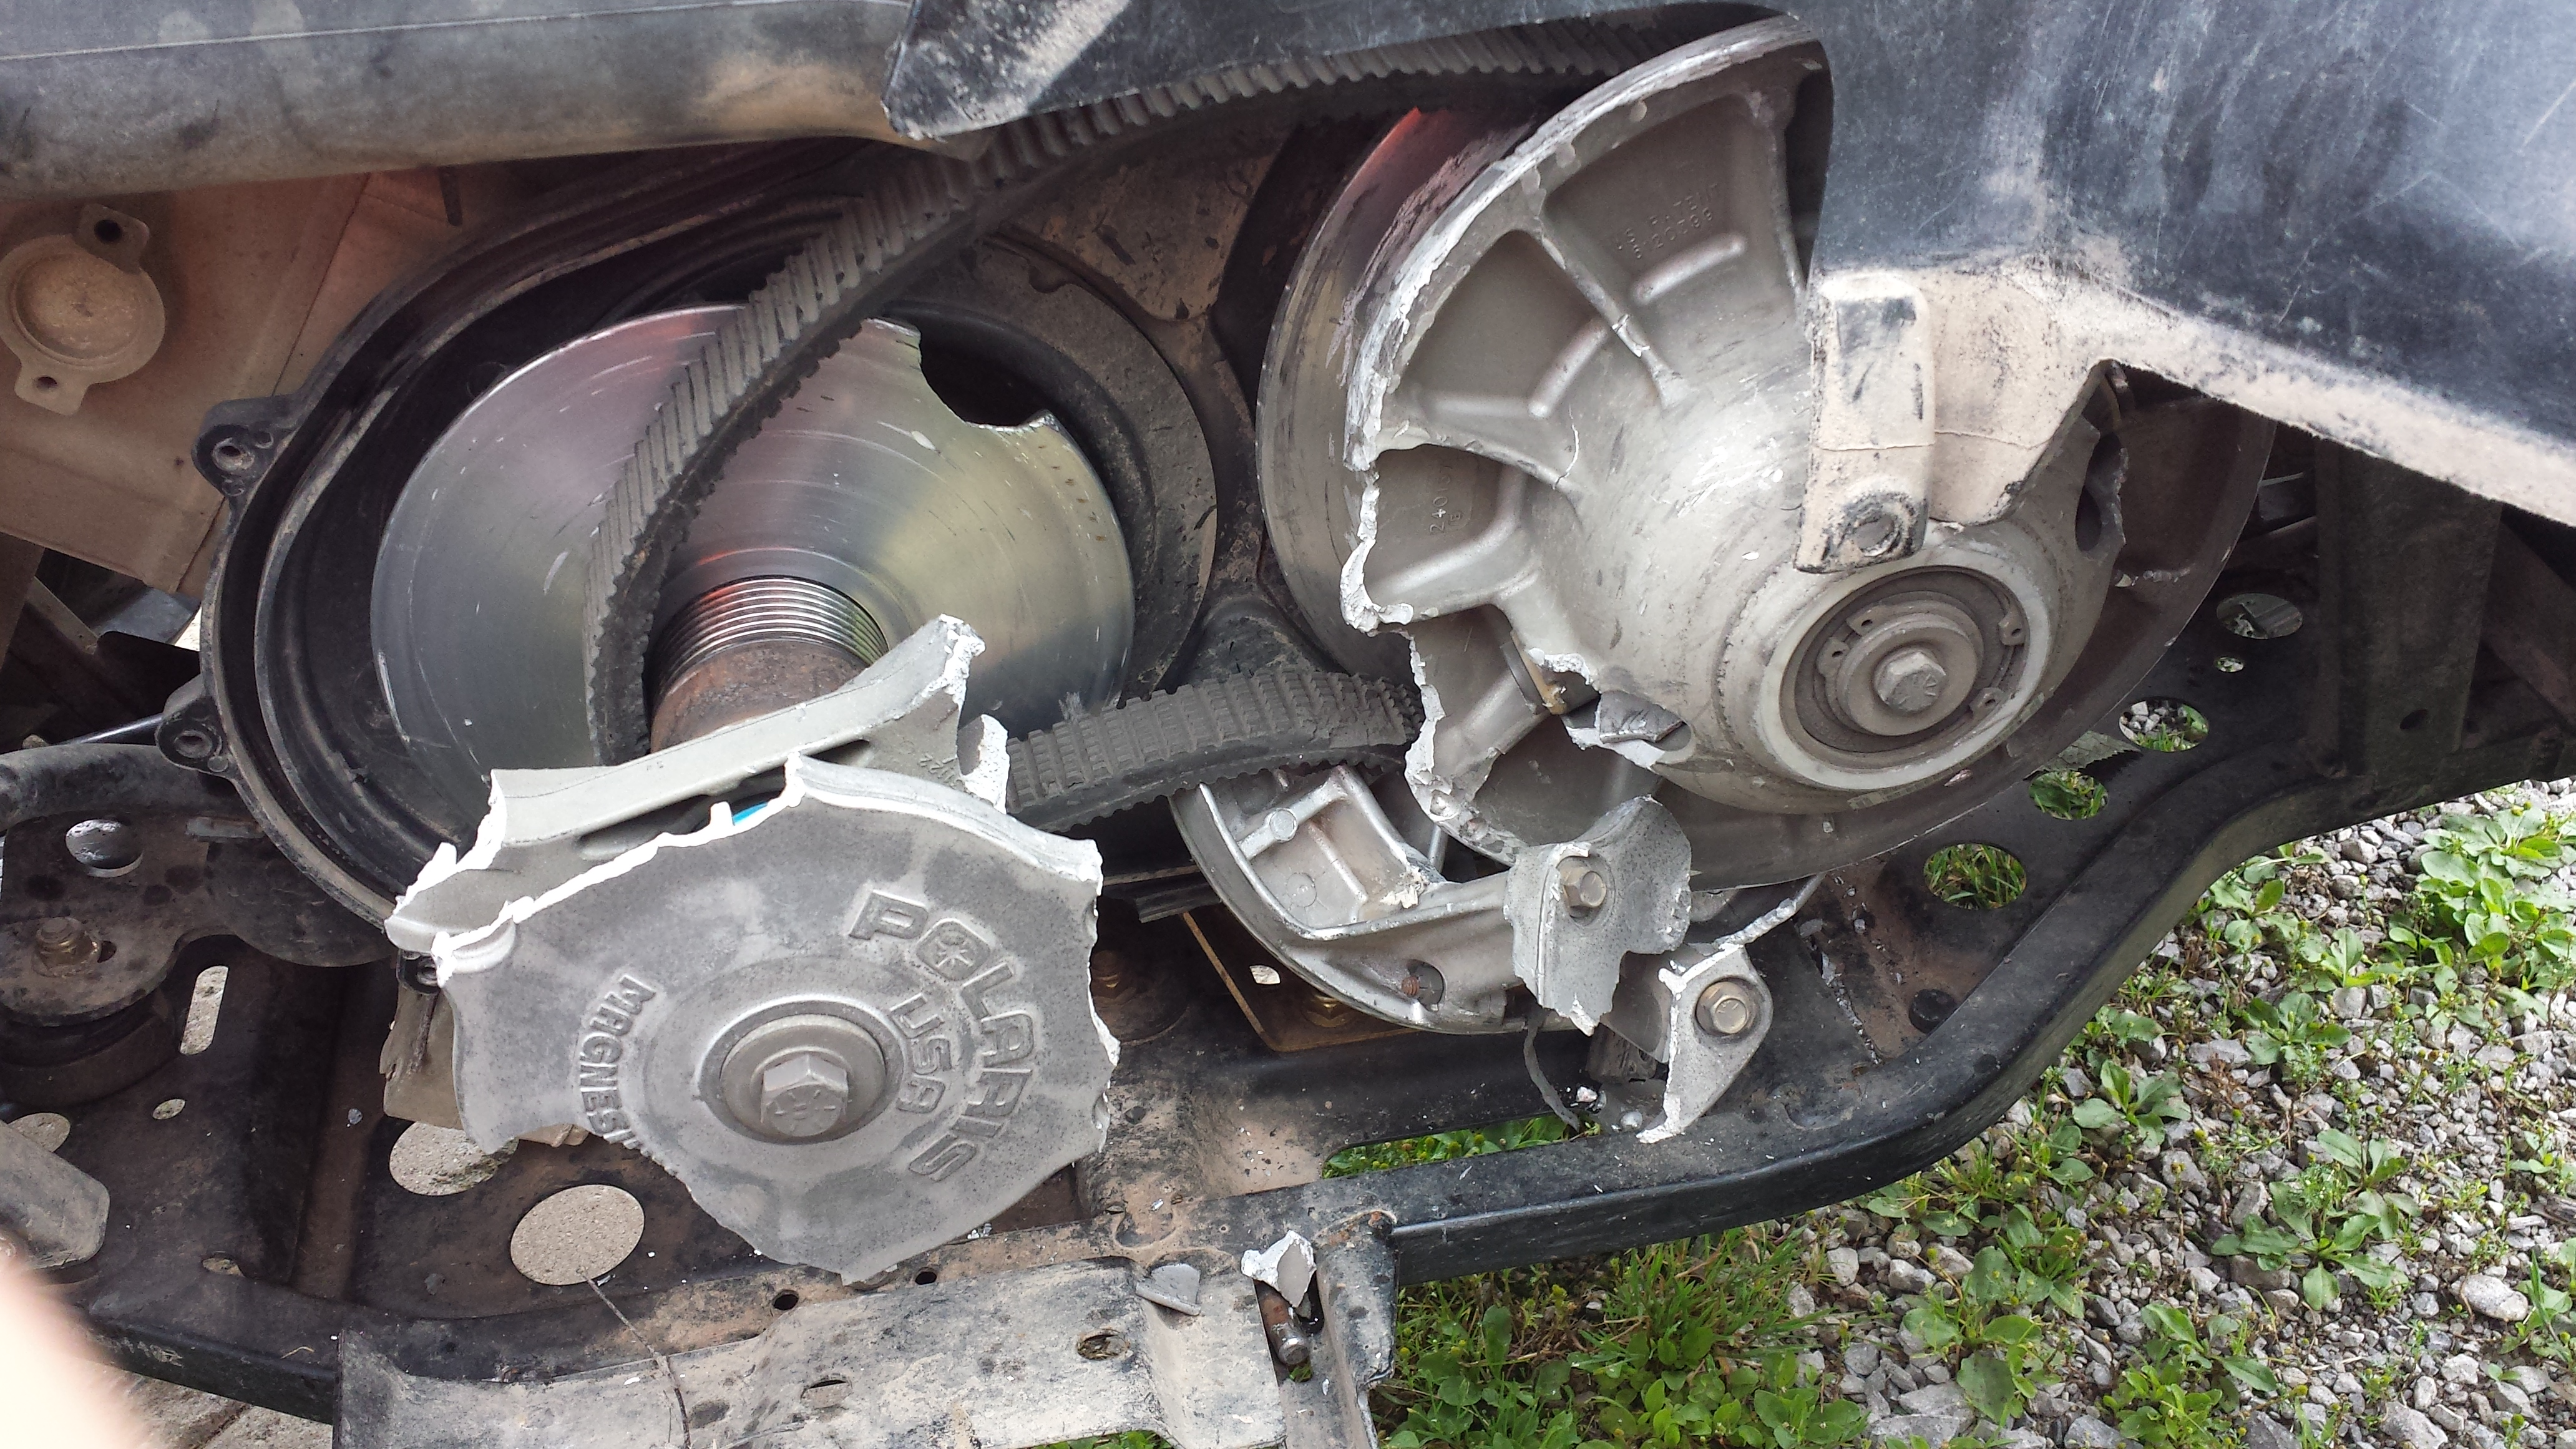 Clutch Exploded 300 Miles On Machine Polaris Rzr Forum